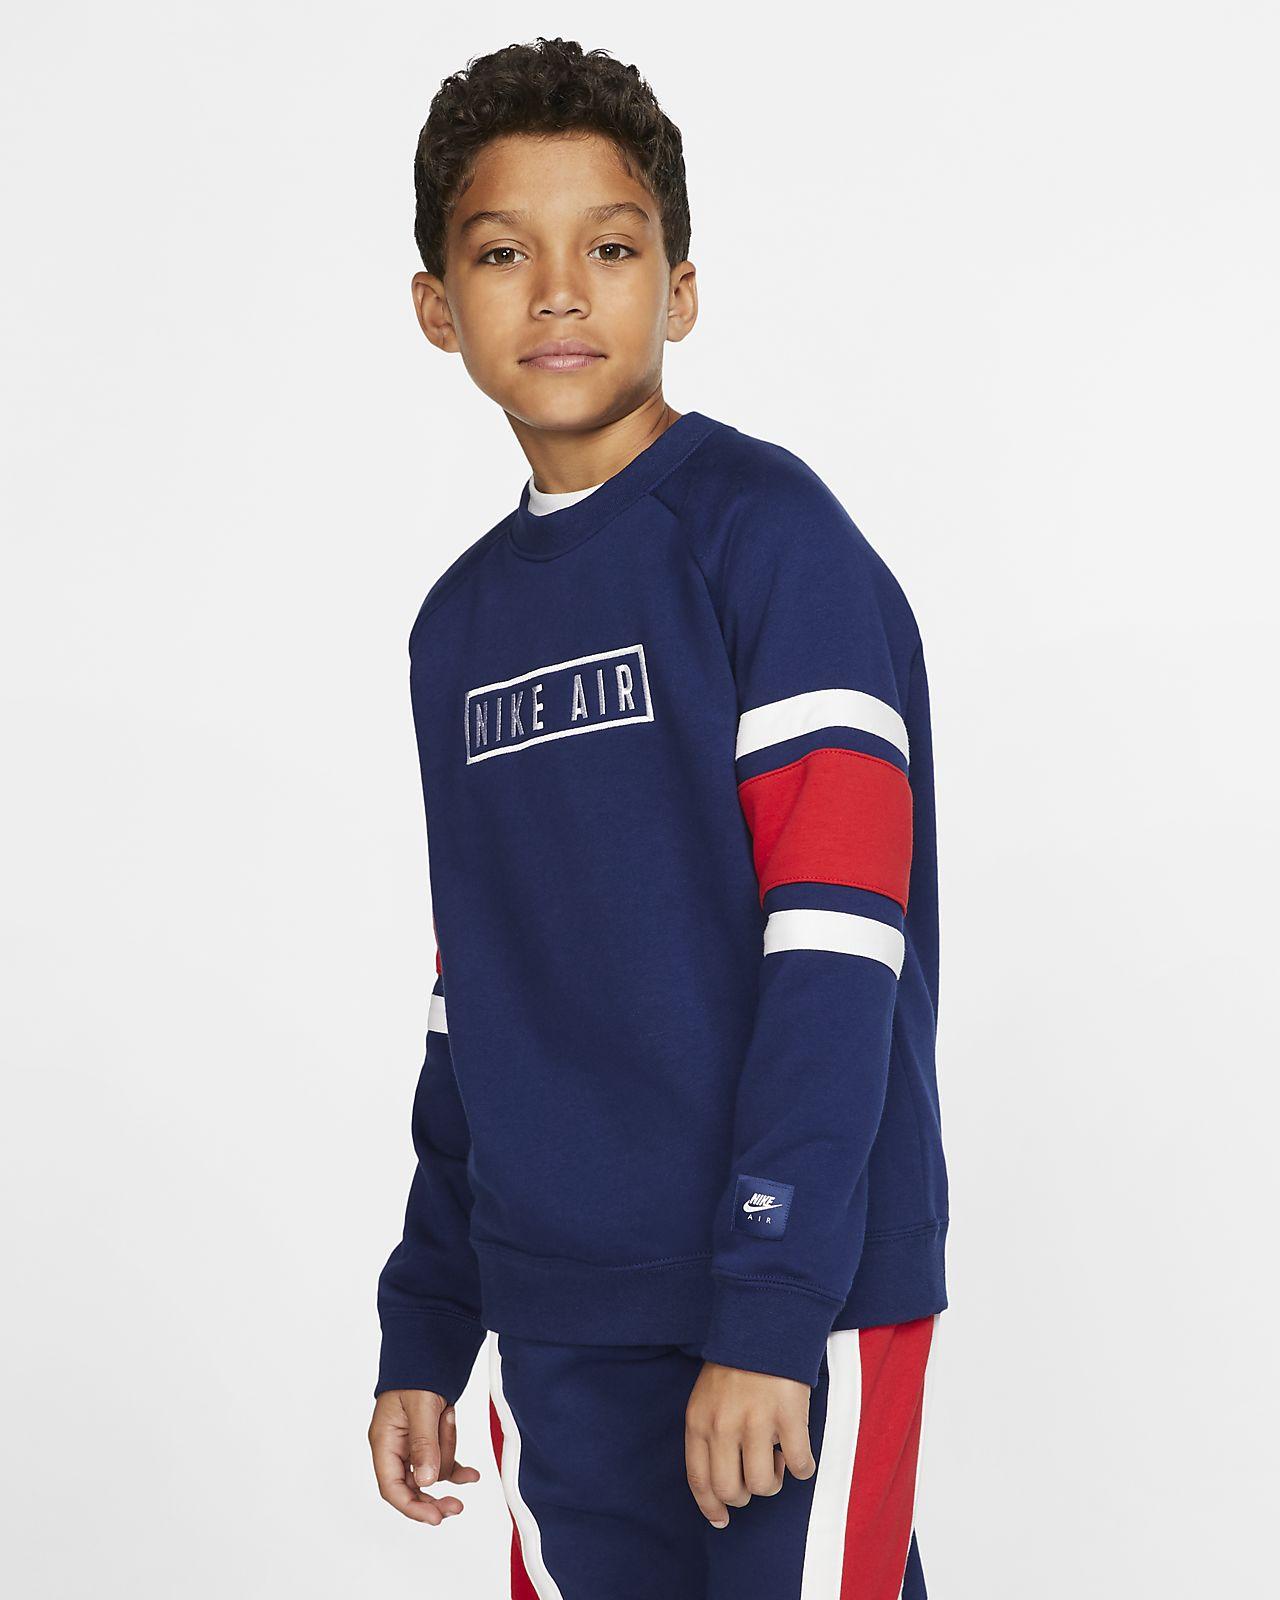 Nike Air Shirt met ronde hals voor kids